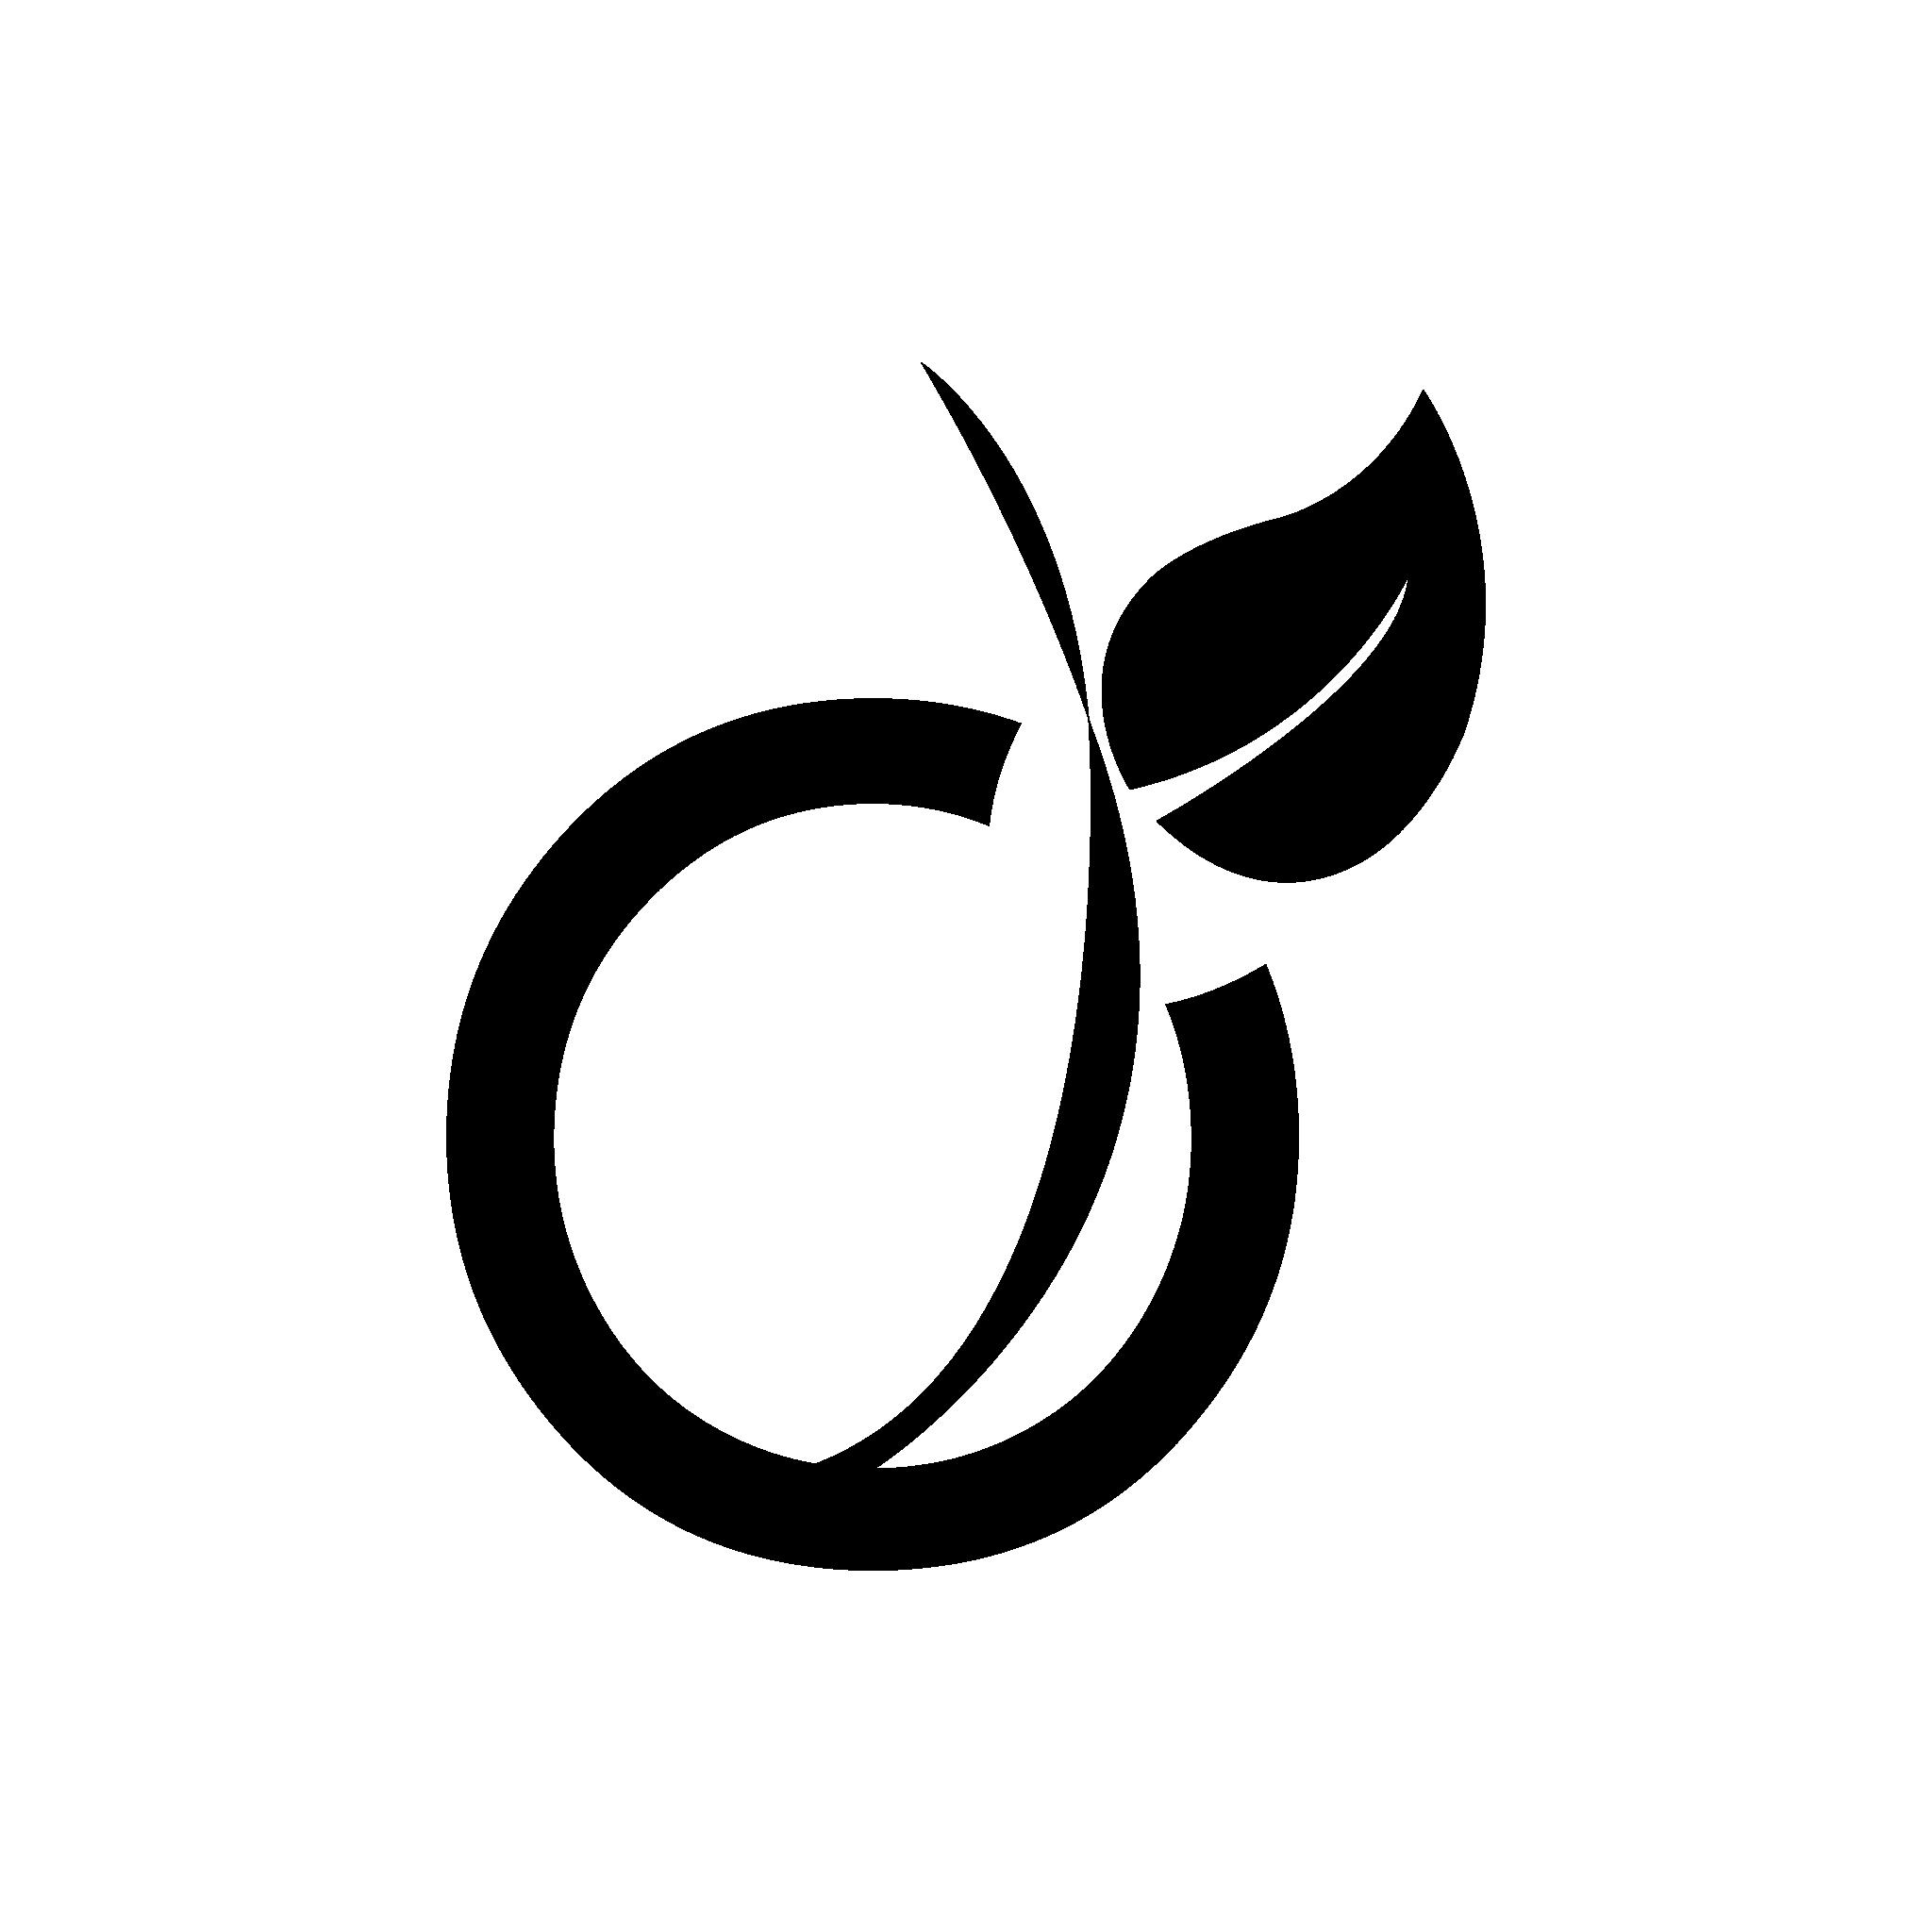 Logo Viadeo listes des fichiers et notices PDF logo viadeo